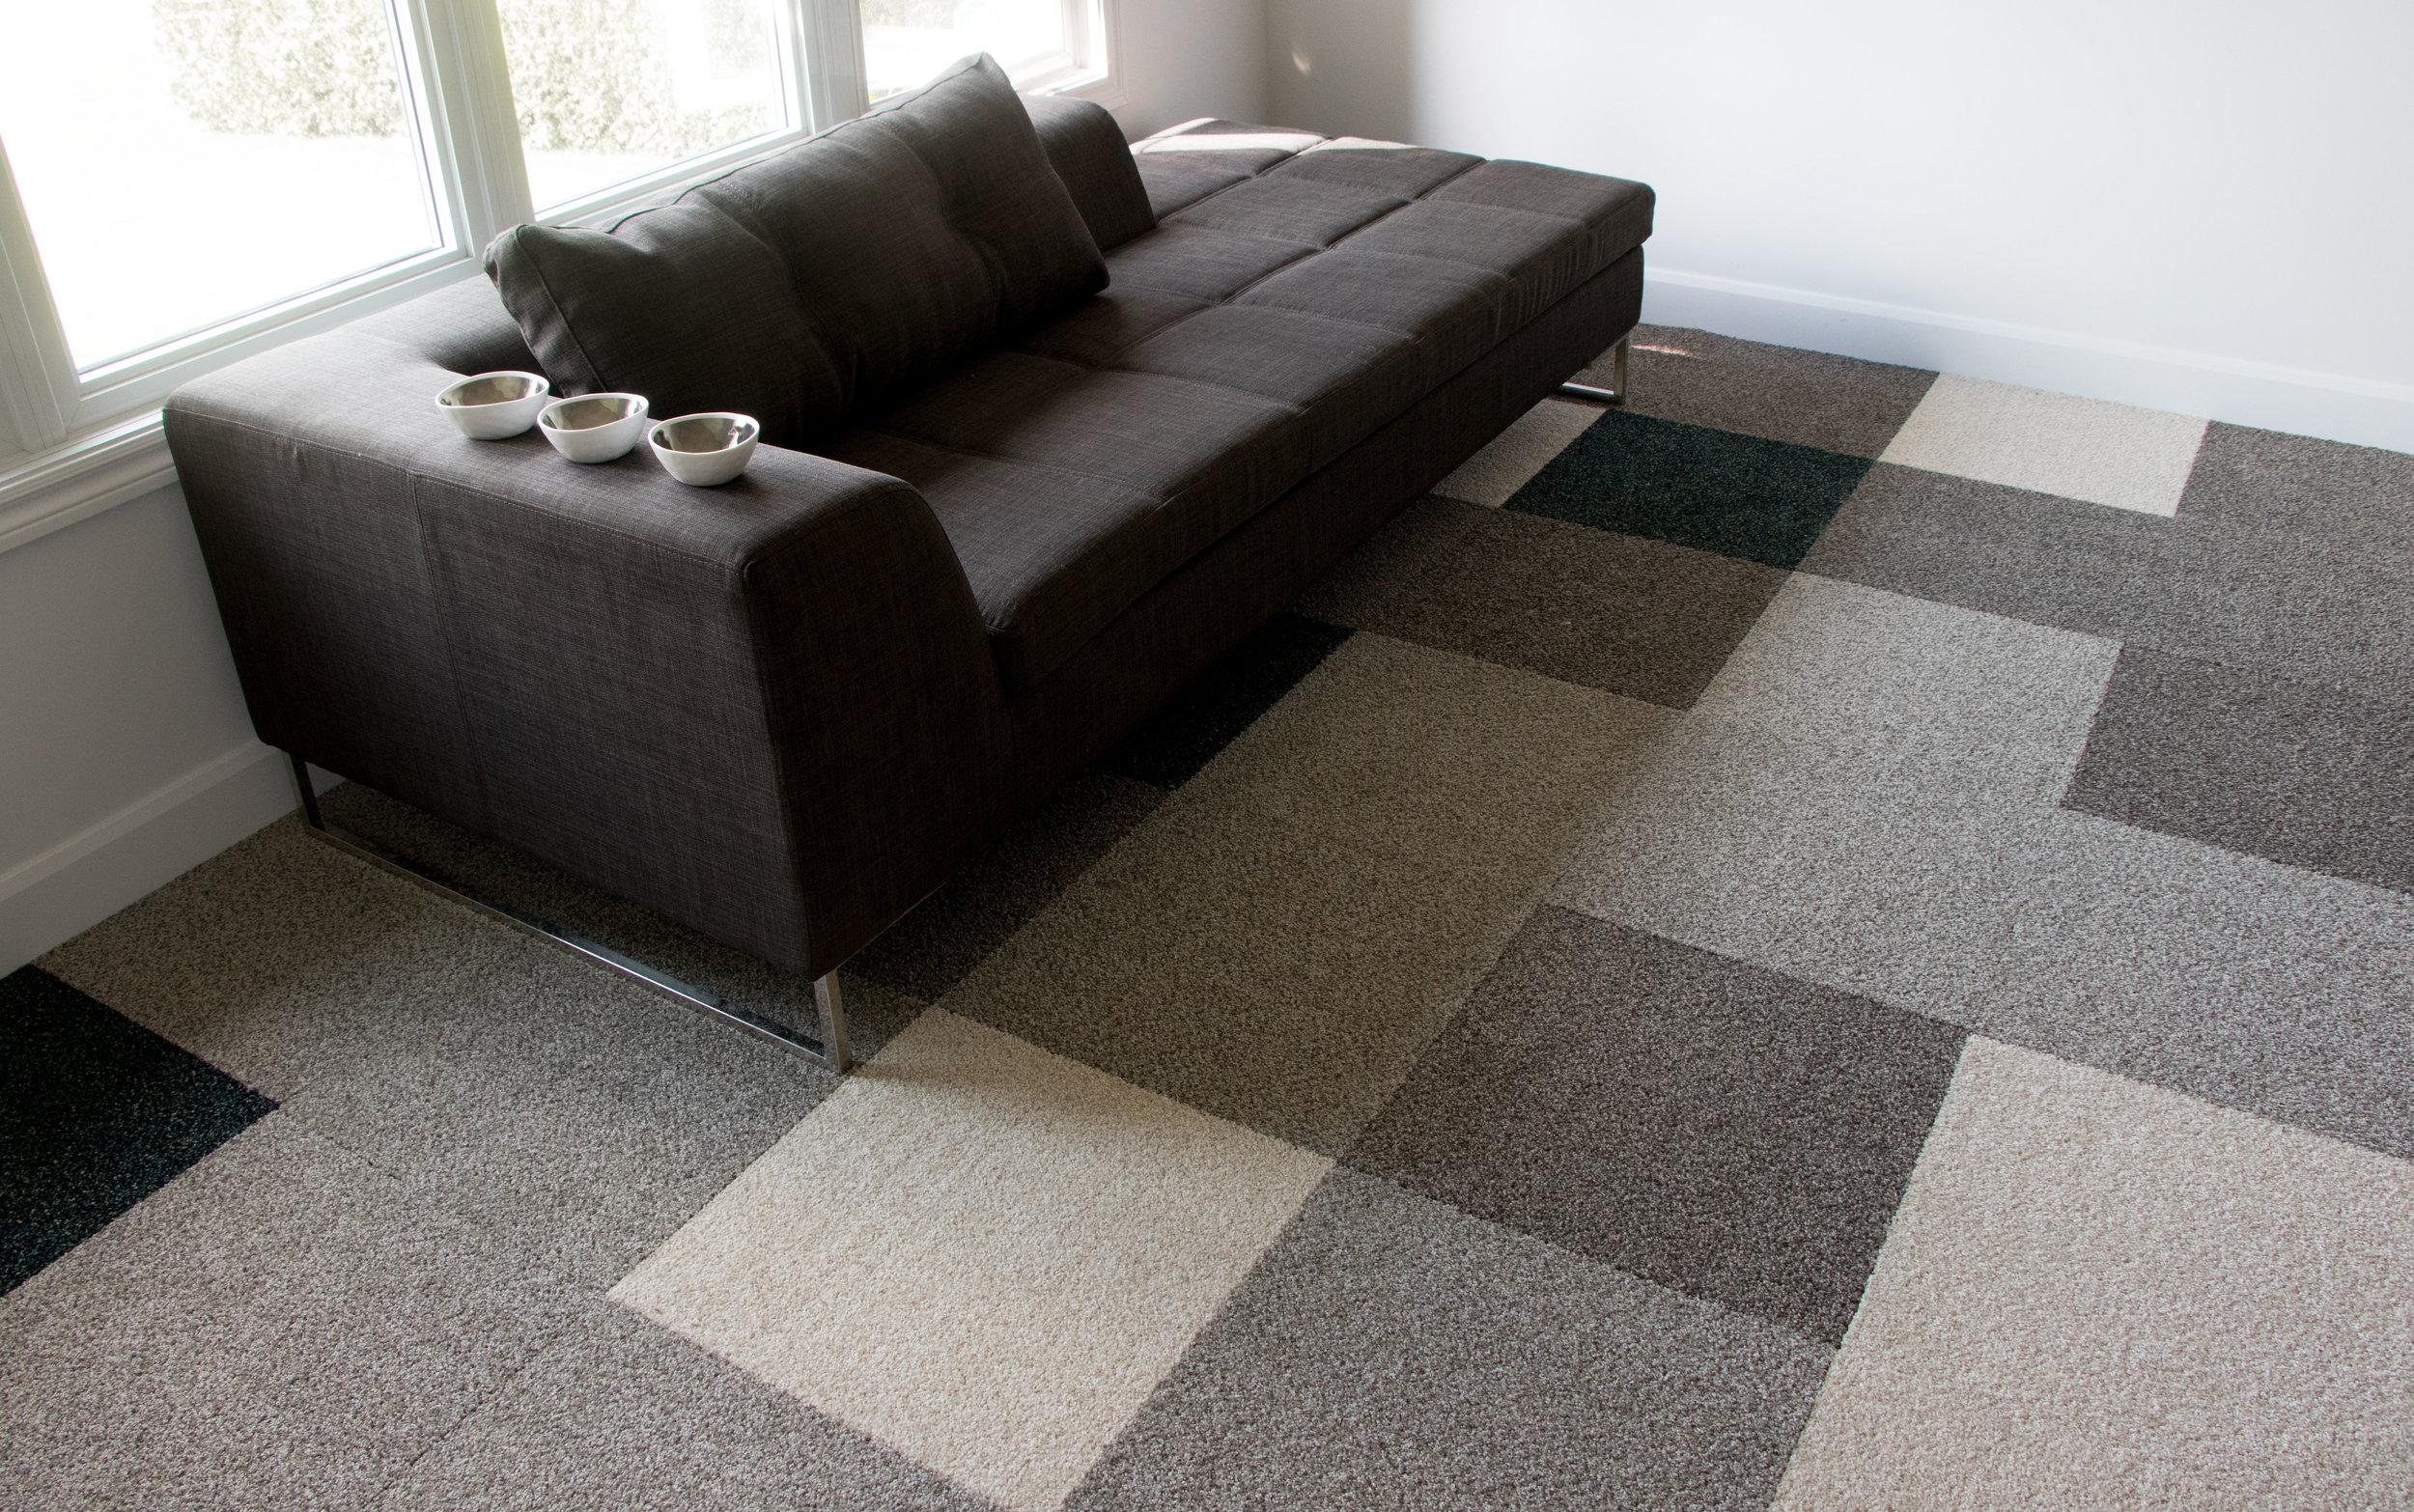 Harmony carpet tile — Full pattern installation